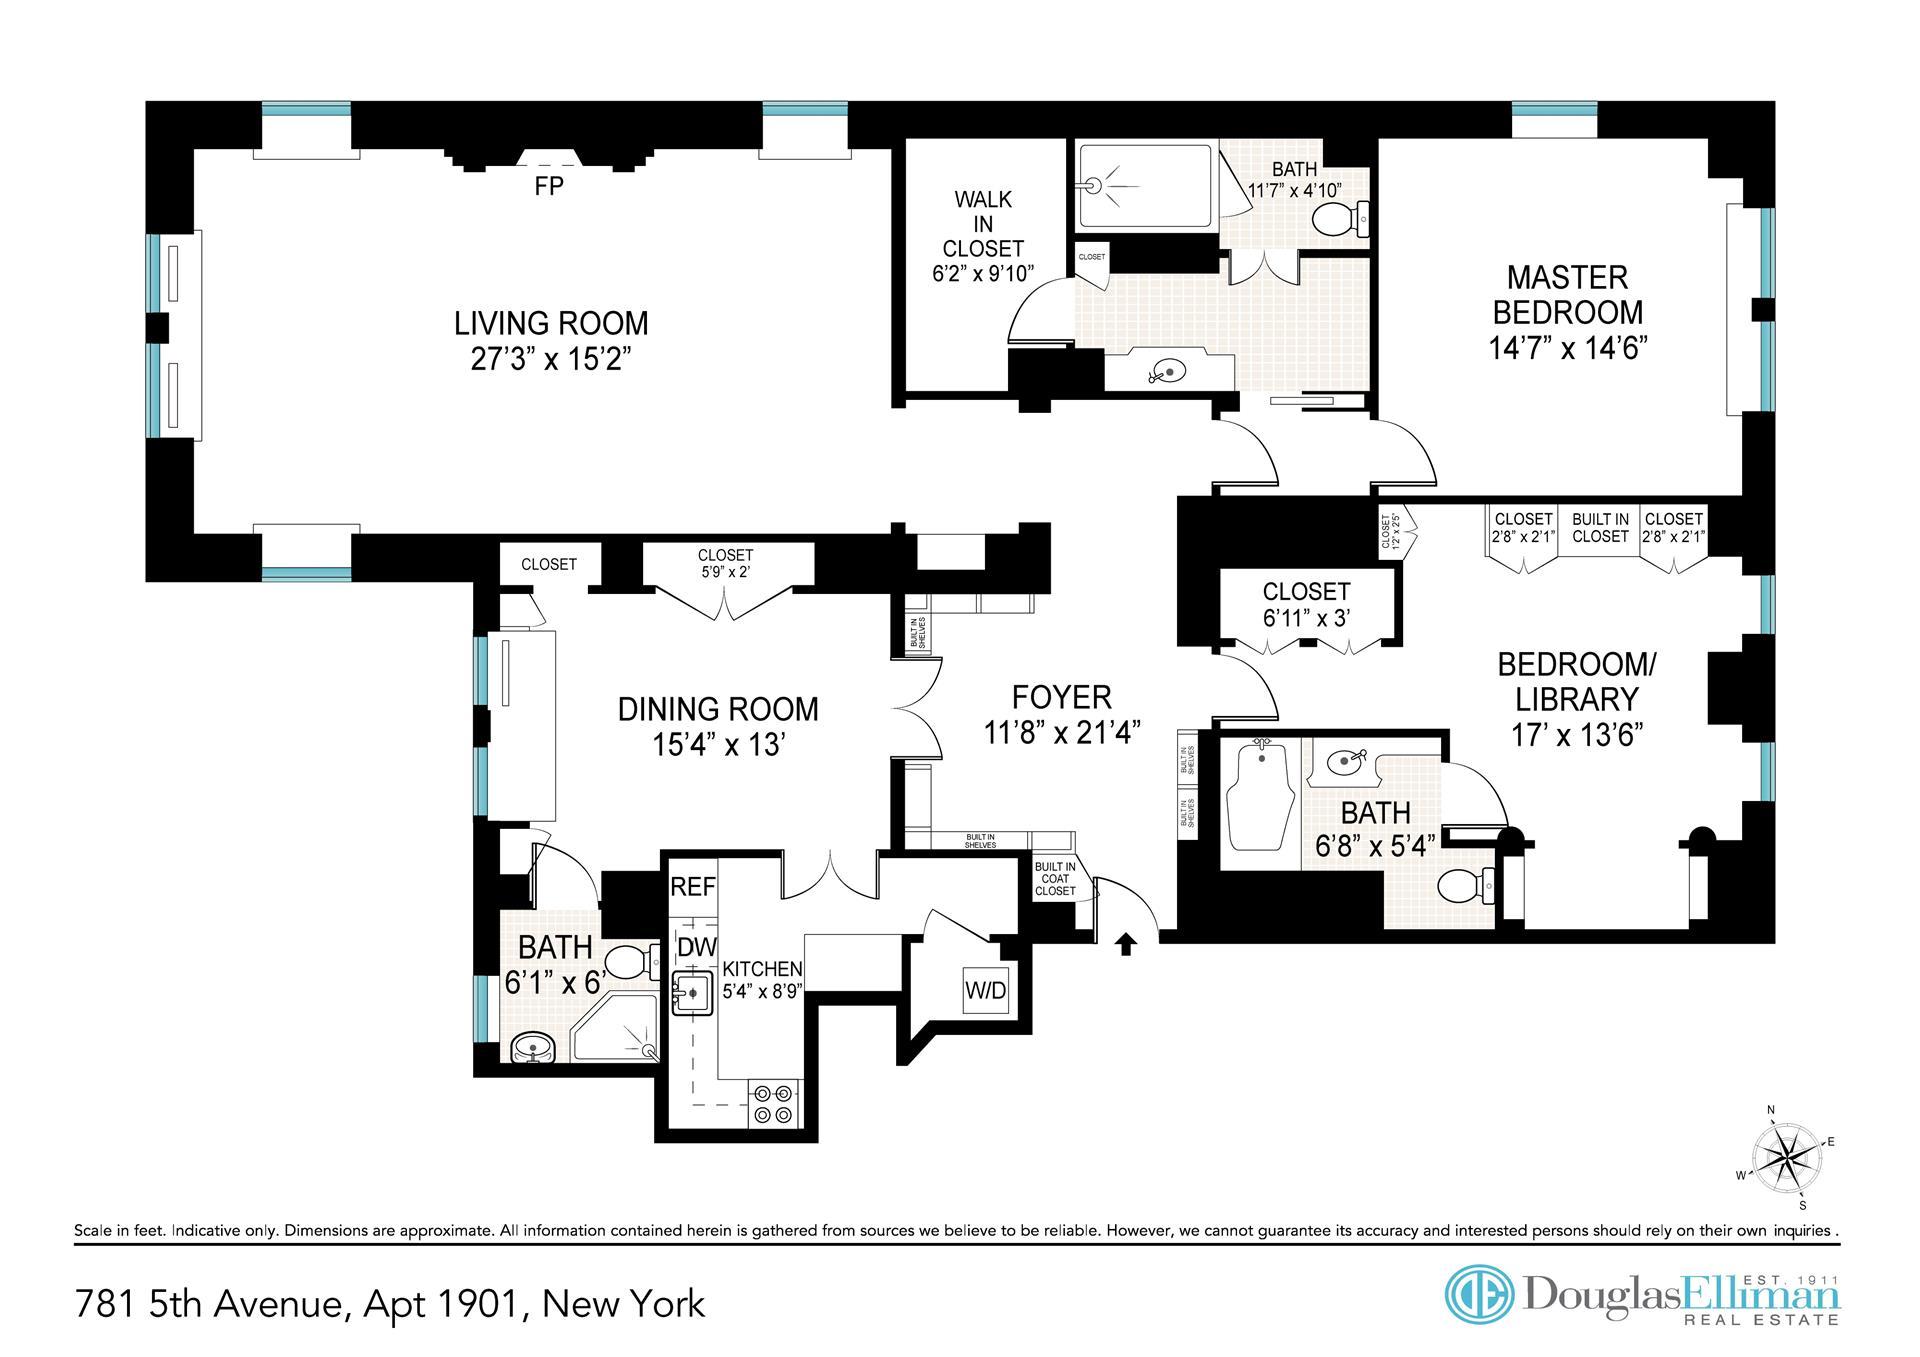 Floor plan of SHERRY NETHERLAND, 781 Fifth Avenue, 1901 - Upper East Side, New York